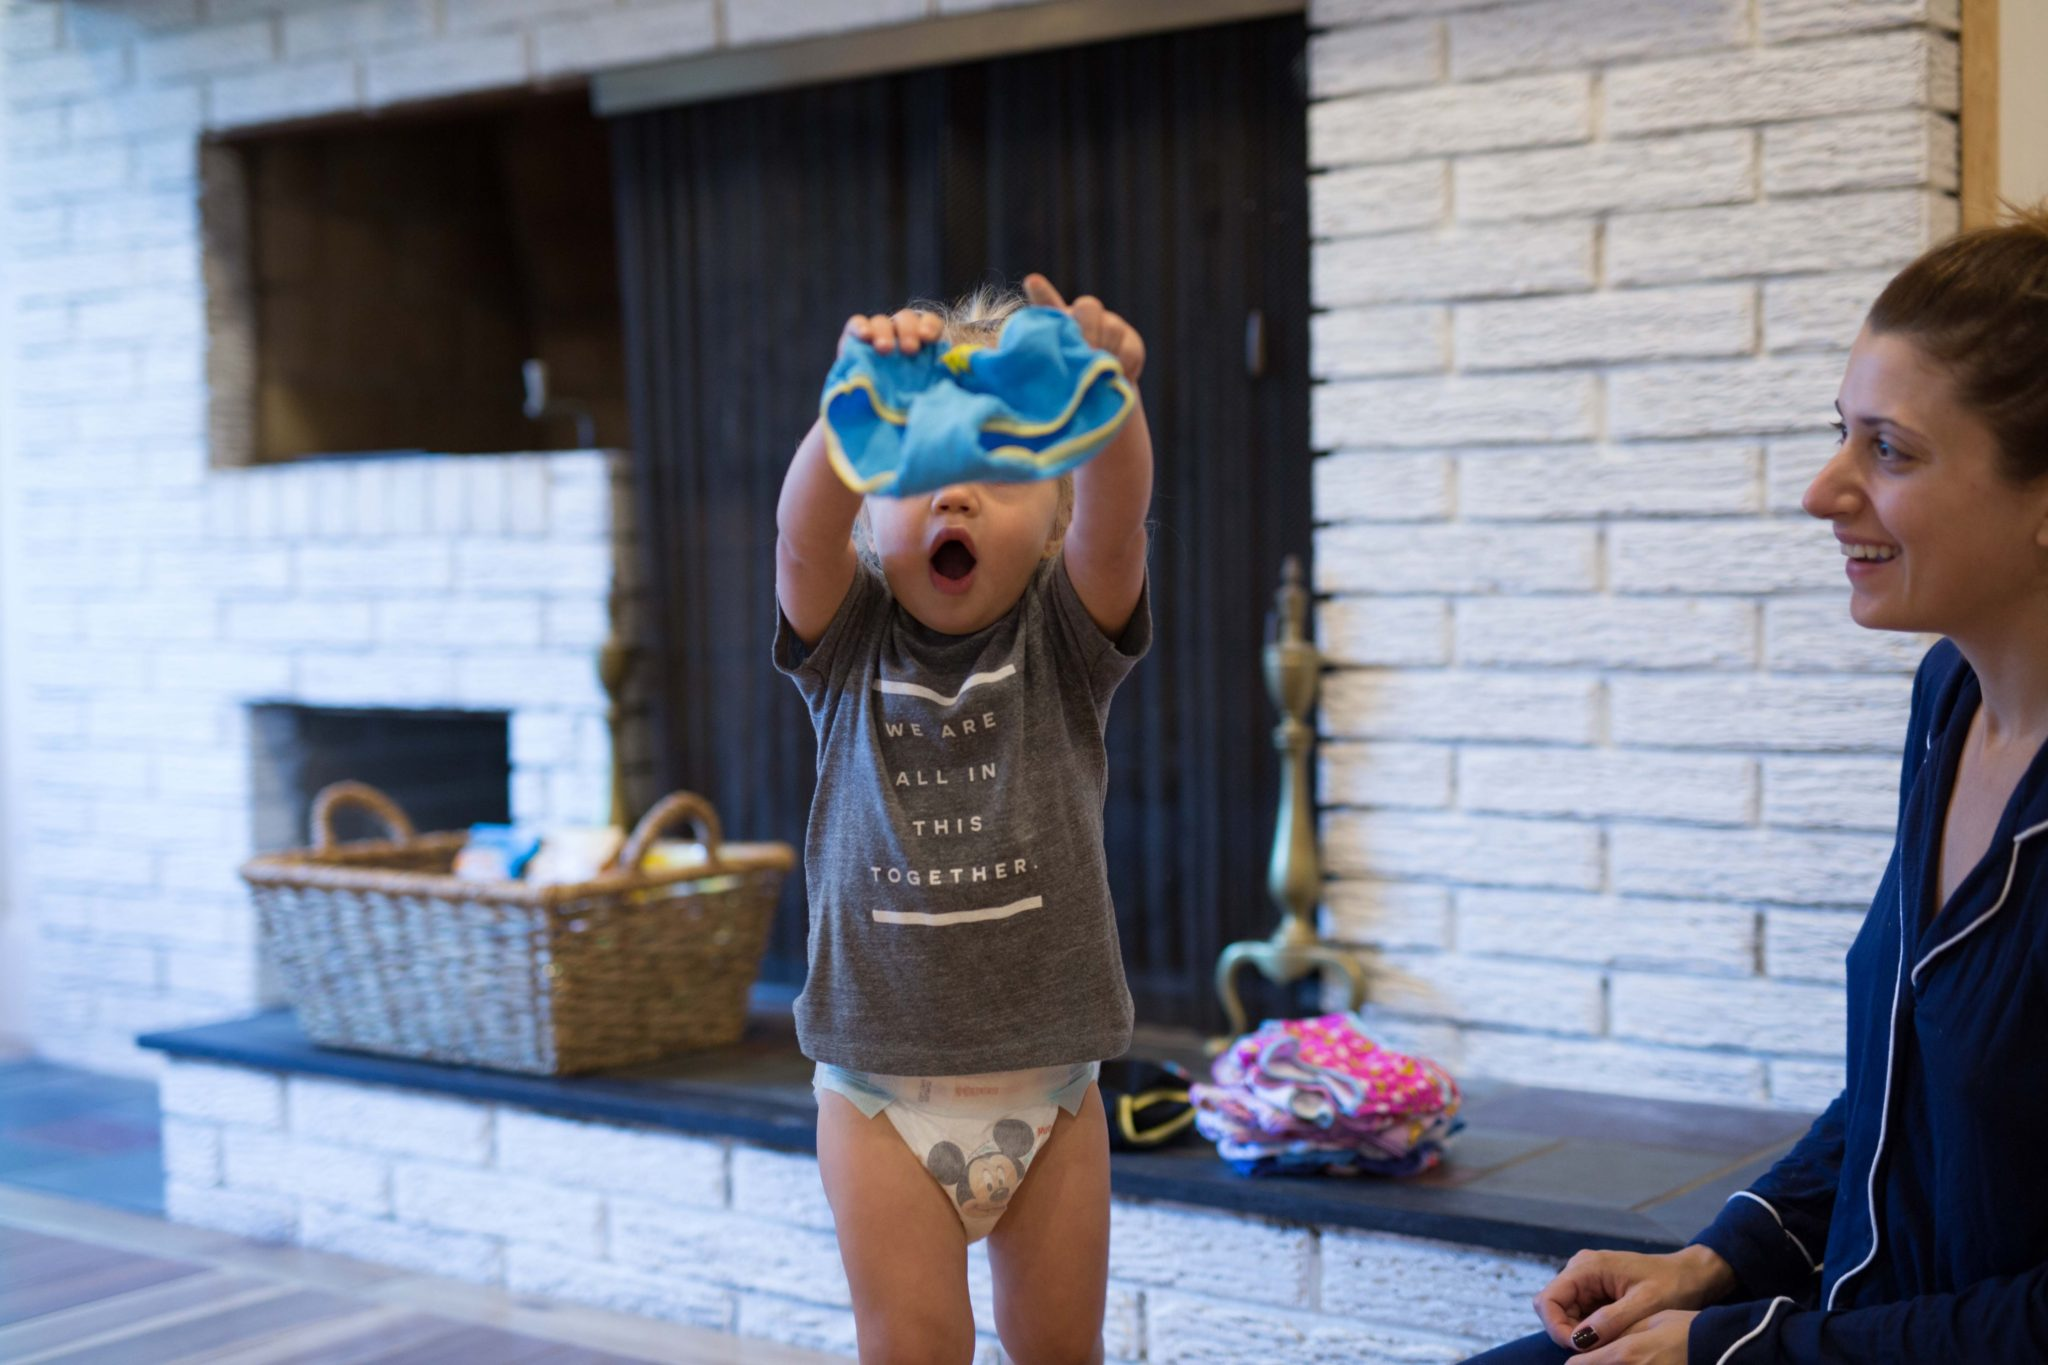 three day potty training method and potty training tips and tricks on allweareblog.com